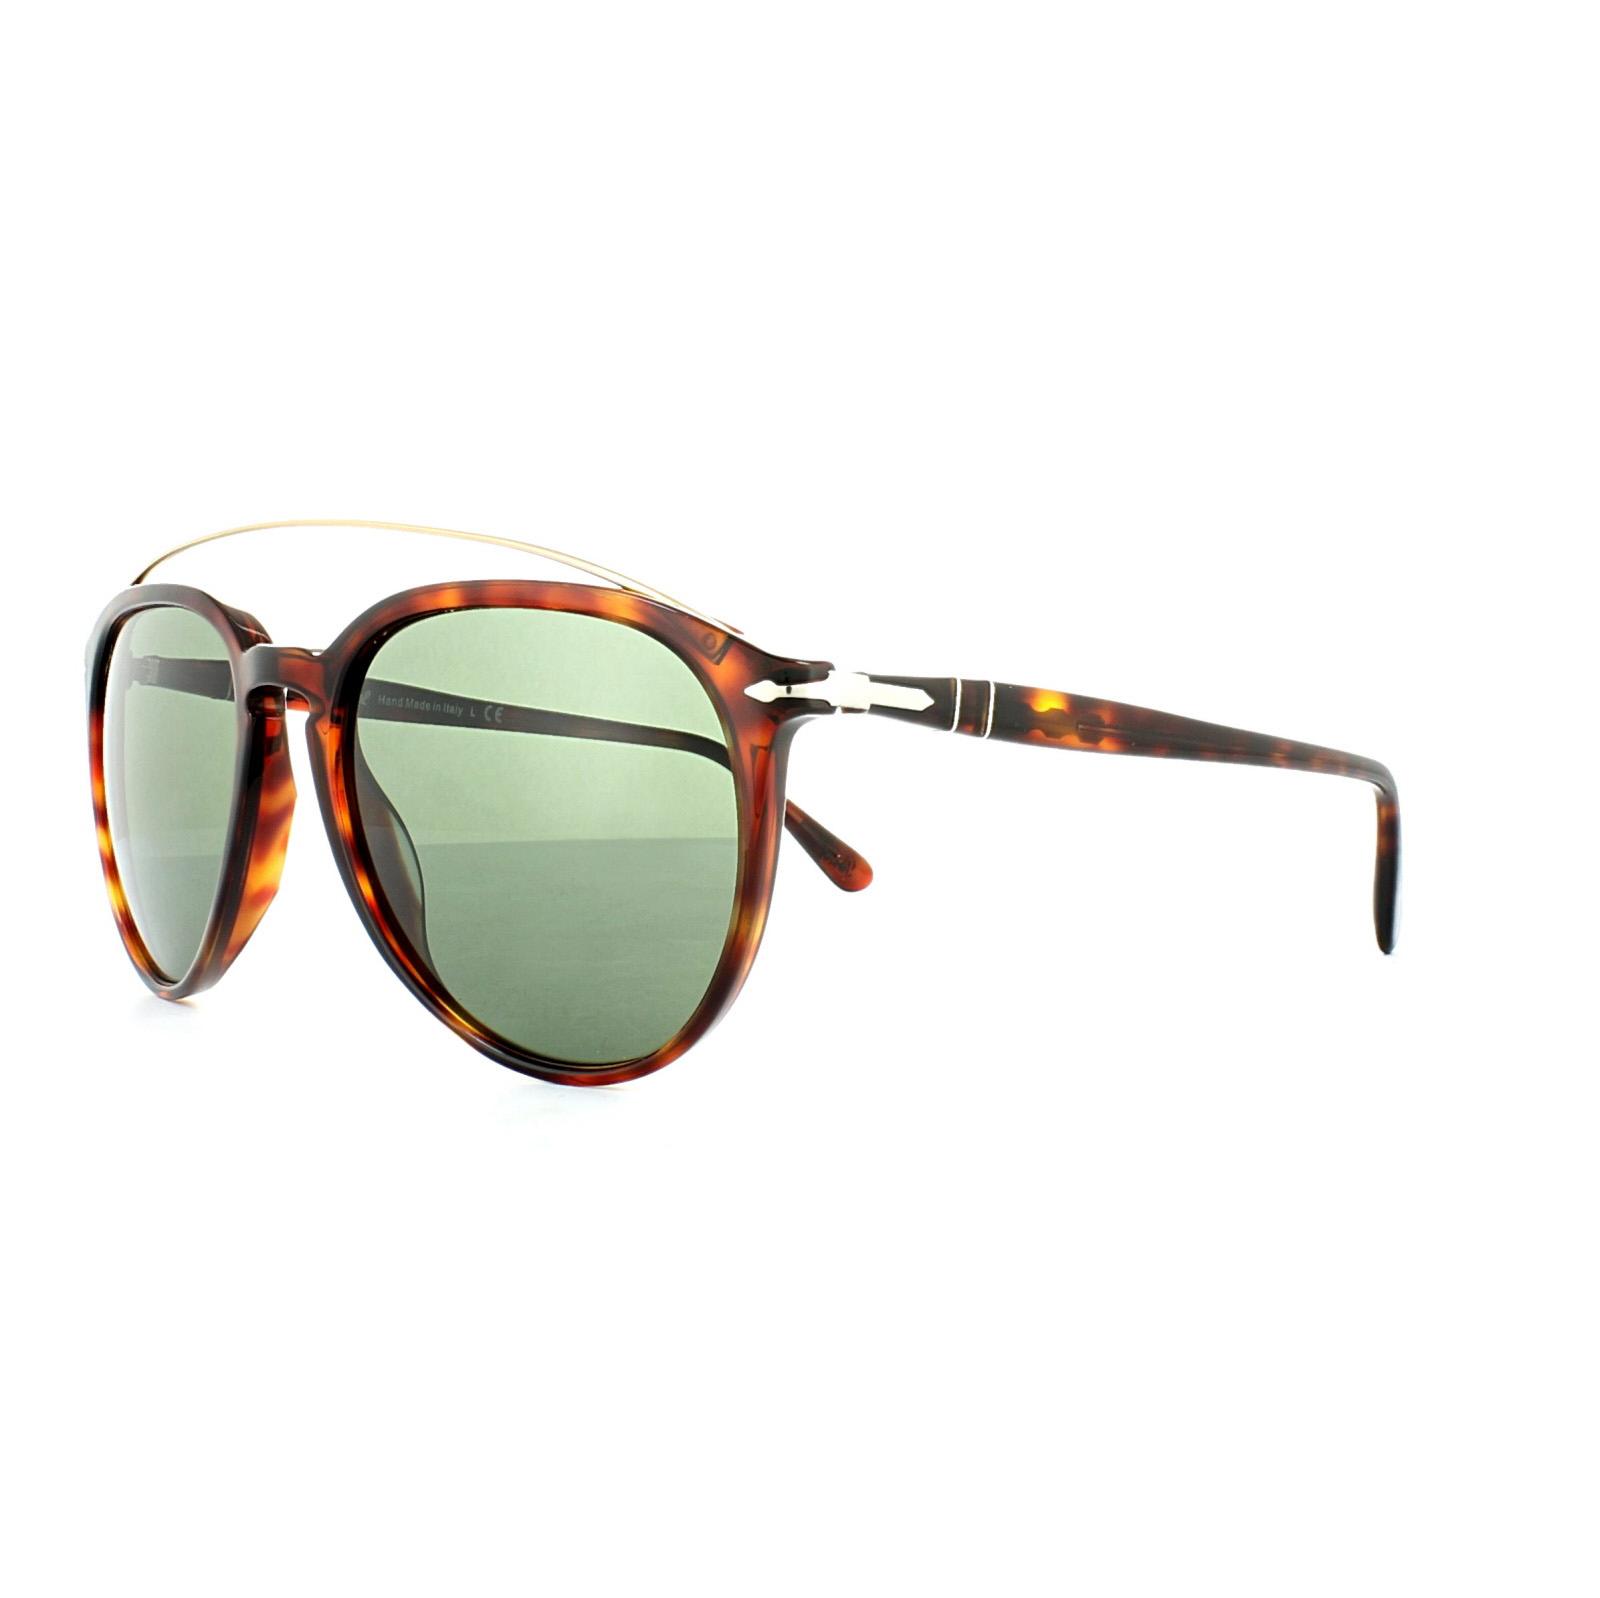 0cbfeb1f49 Persol Sunglasses 3159 9015 31 Havana Green 8053672665659